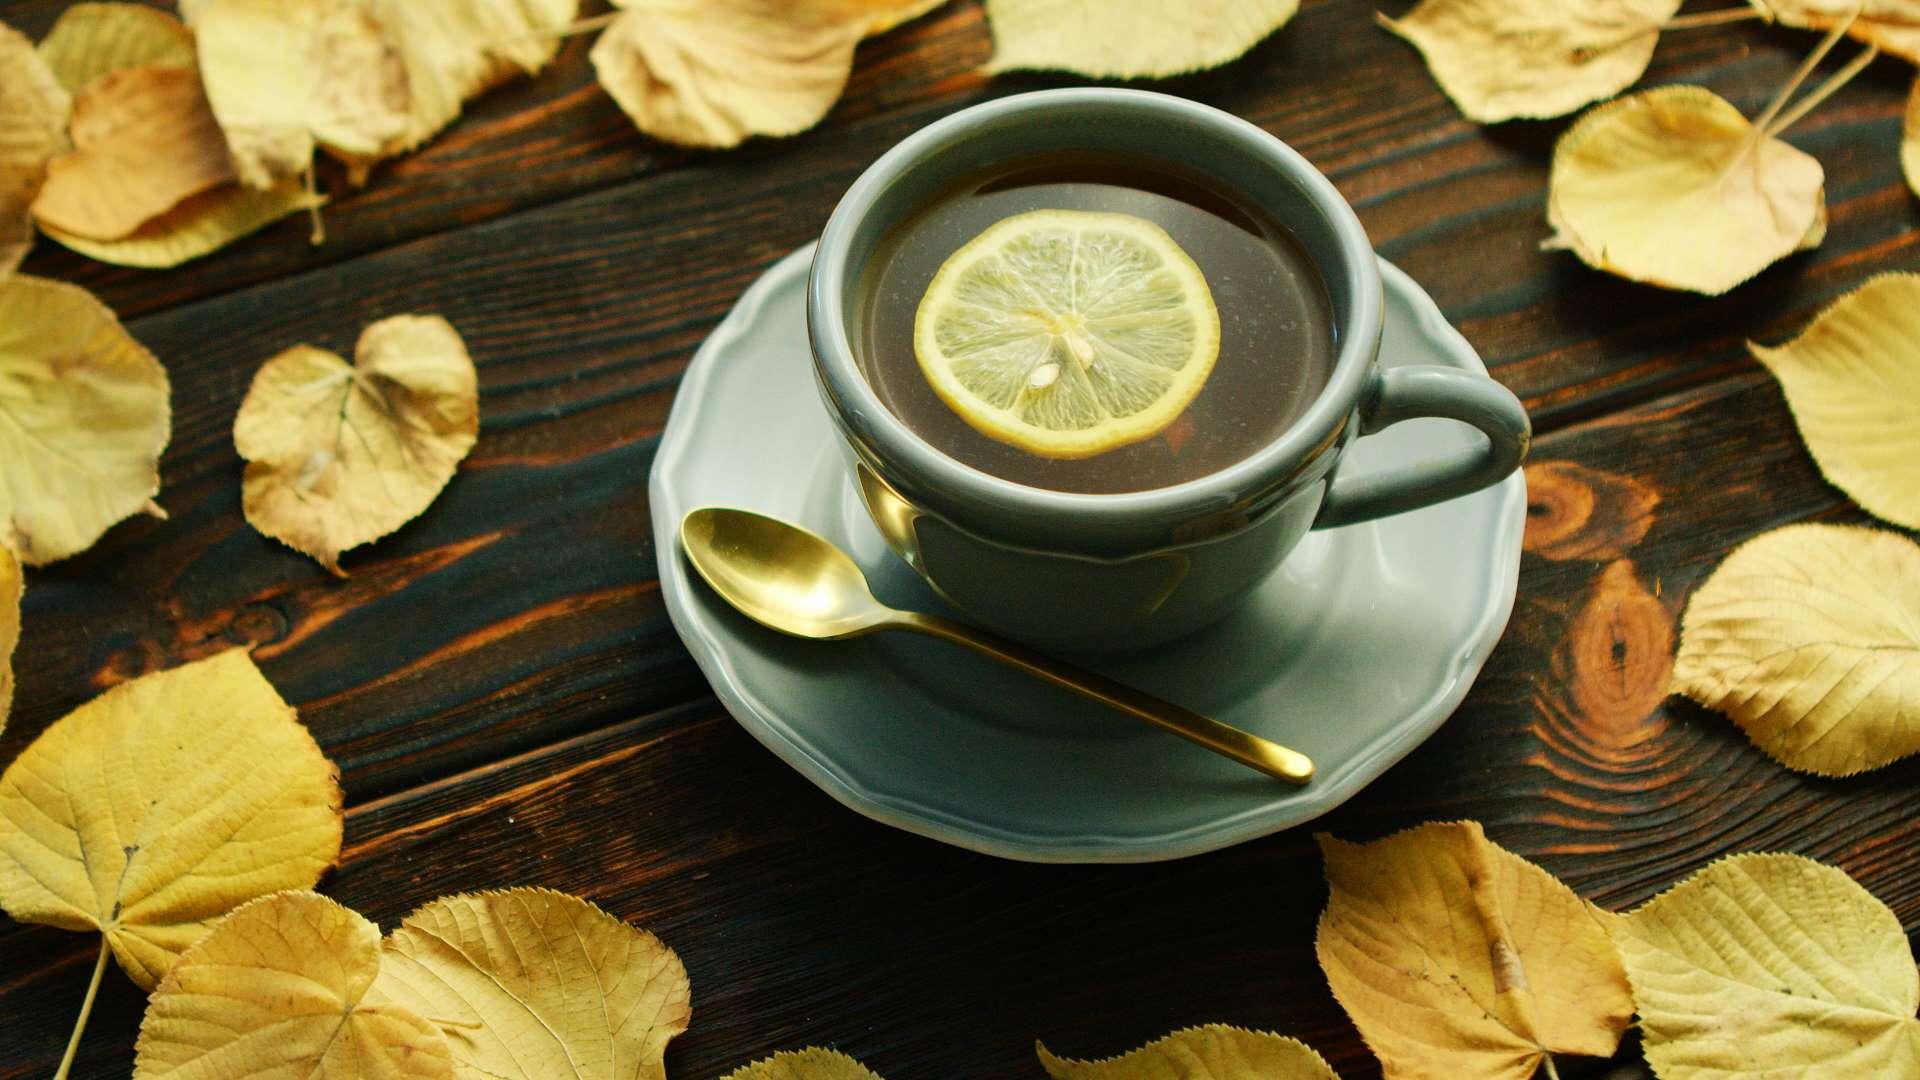 idratazione per combattere l'influenza